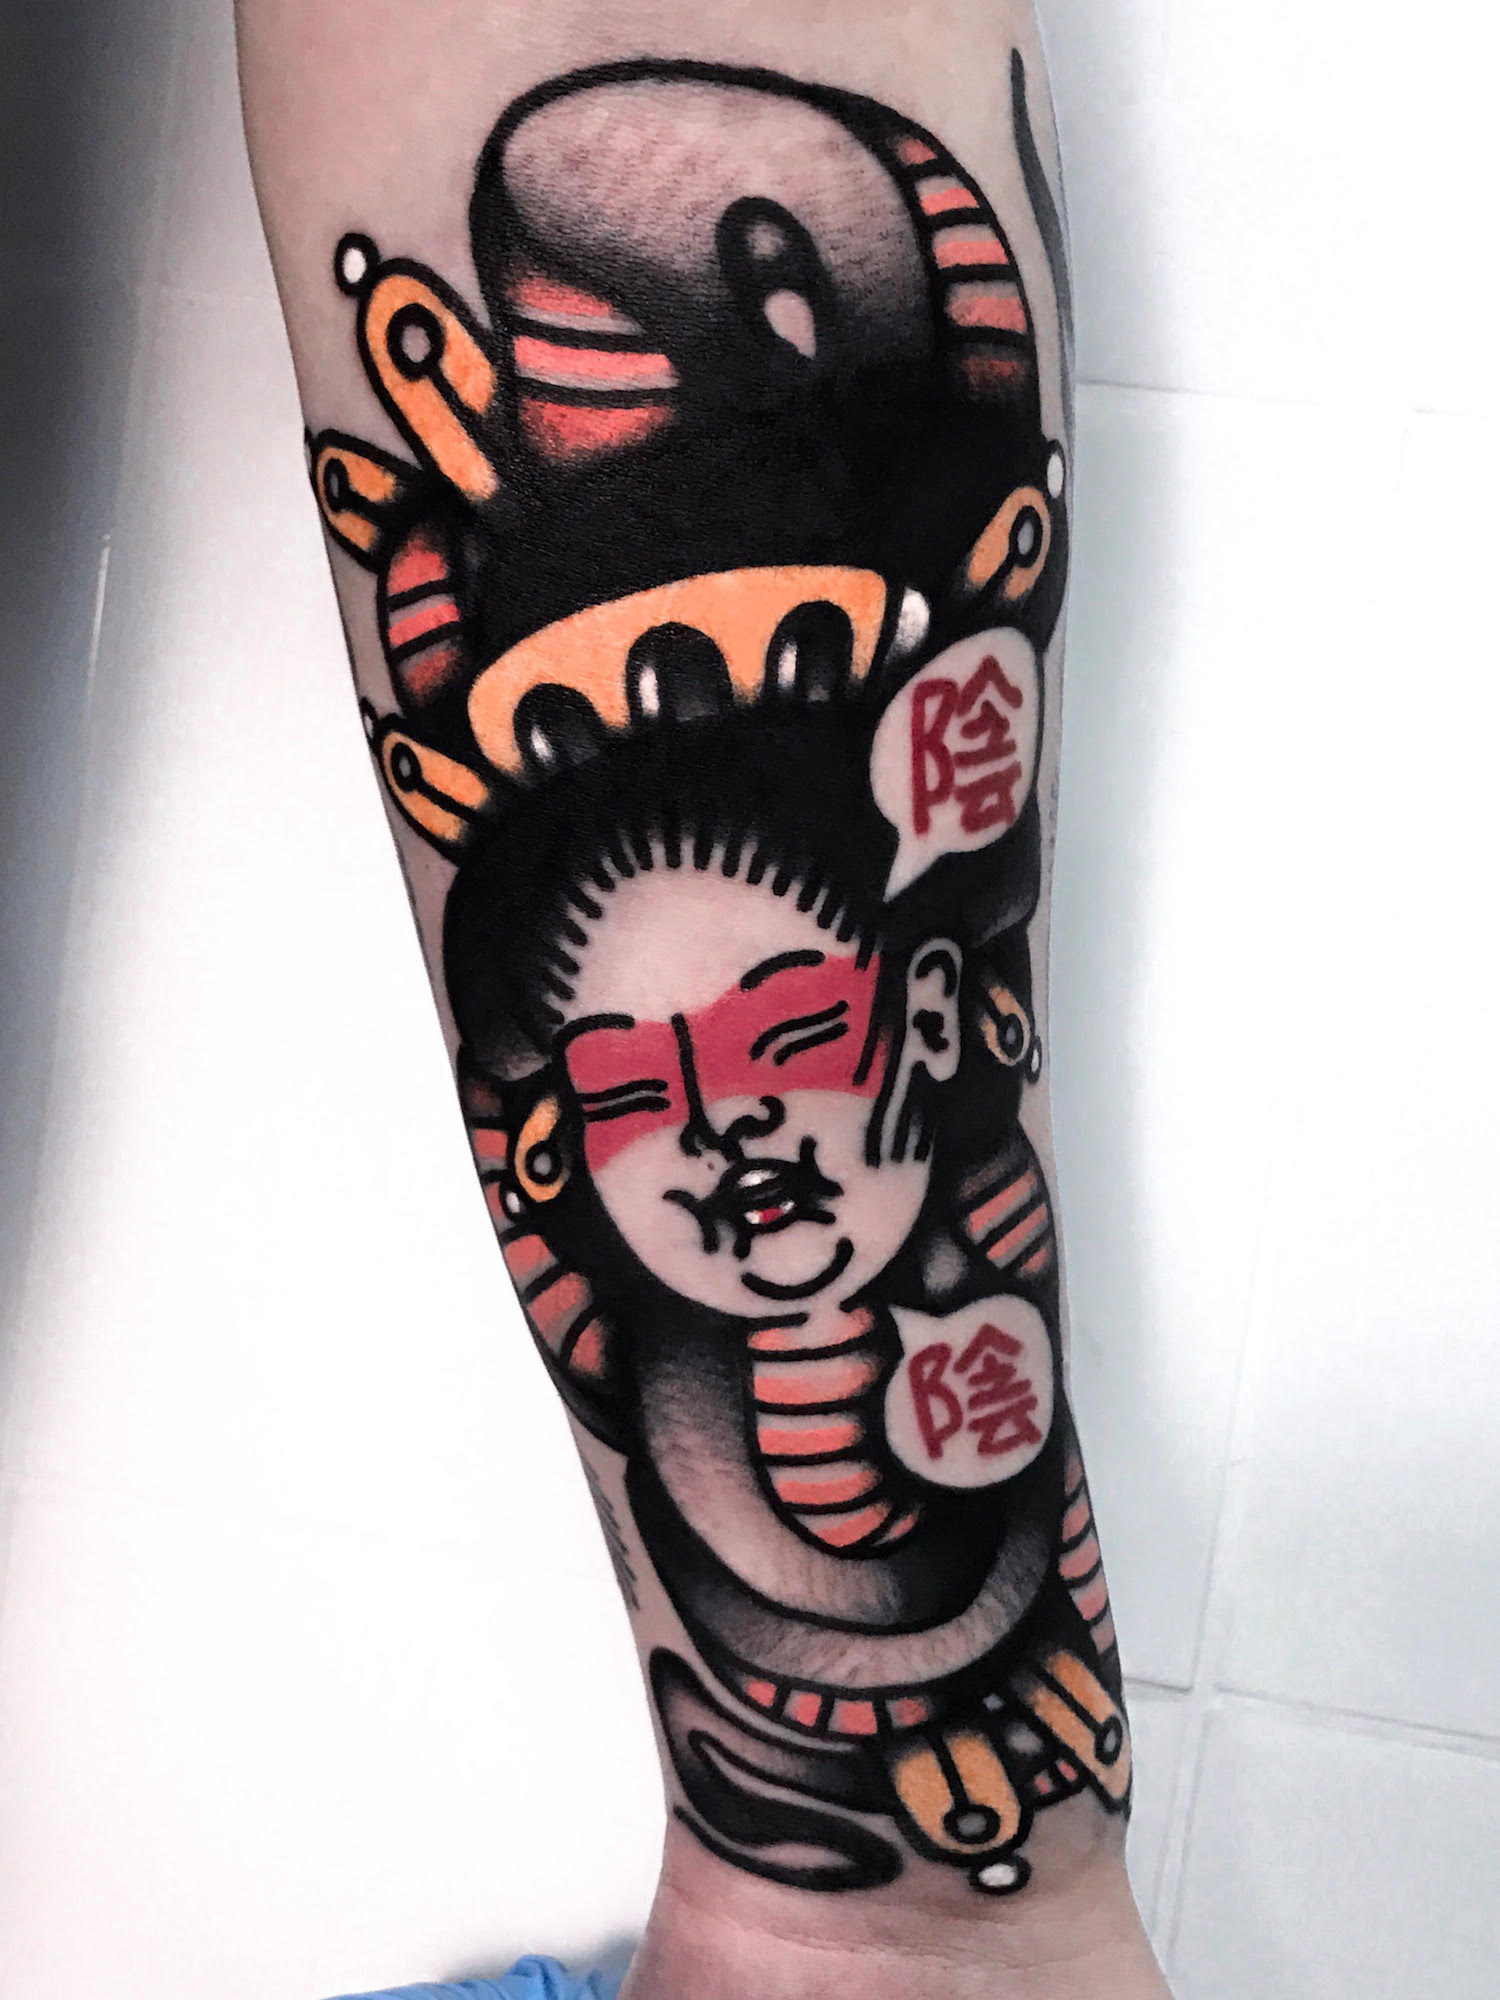 Geisha tattoo on arm